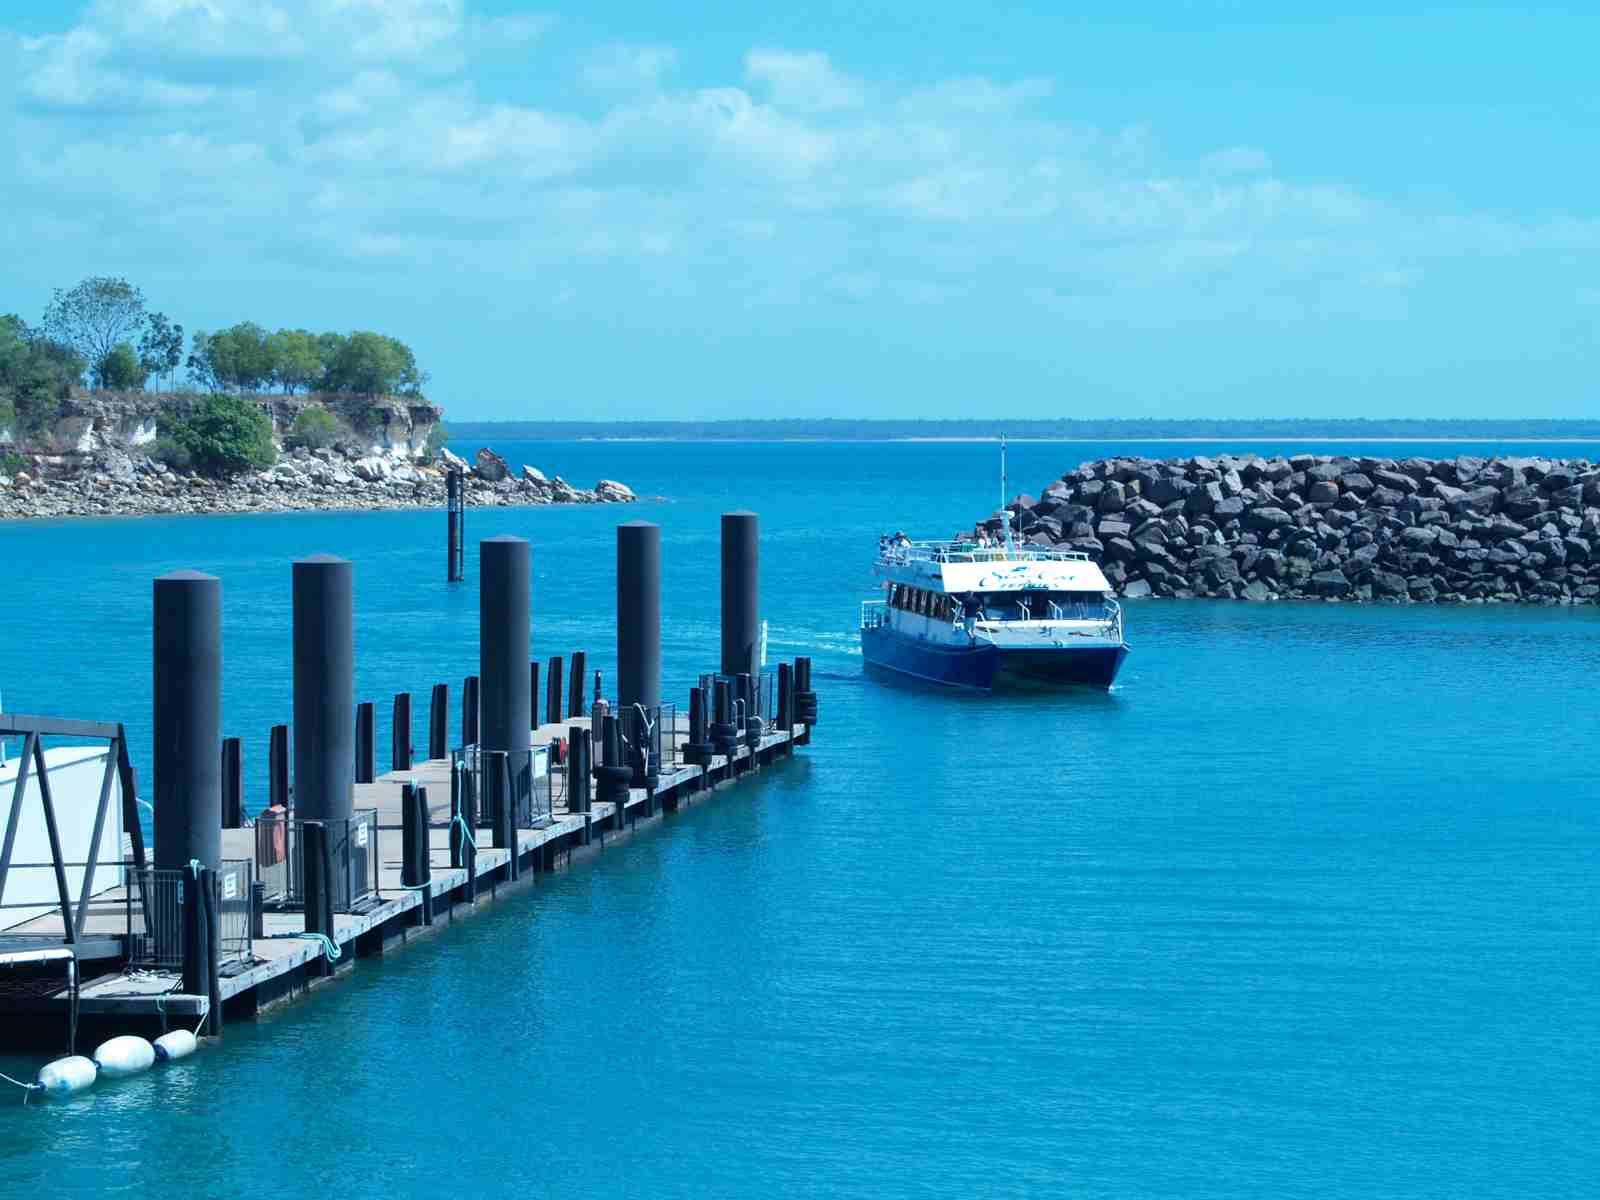 Cullen Bay Ferry Terminal